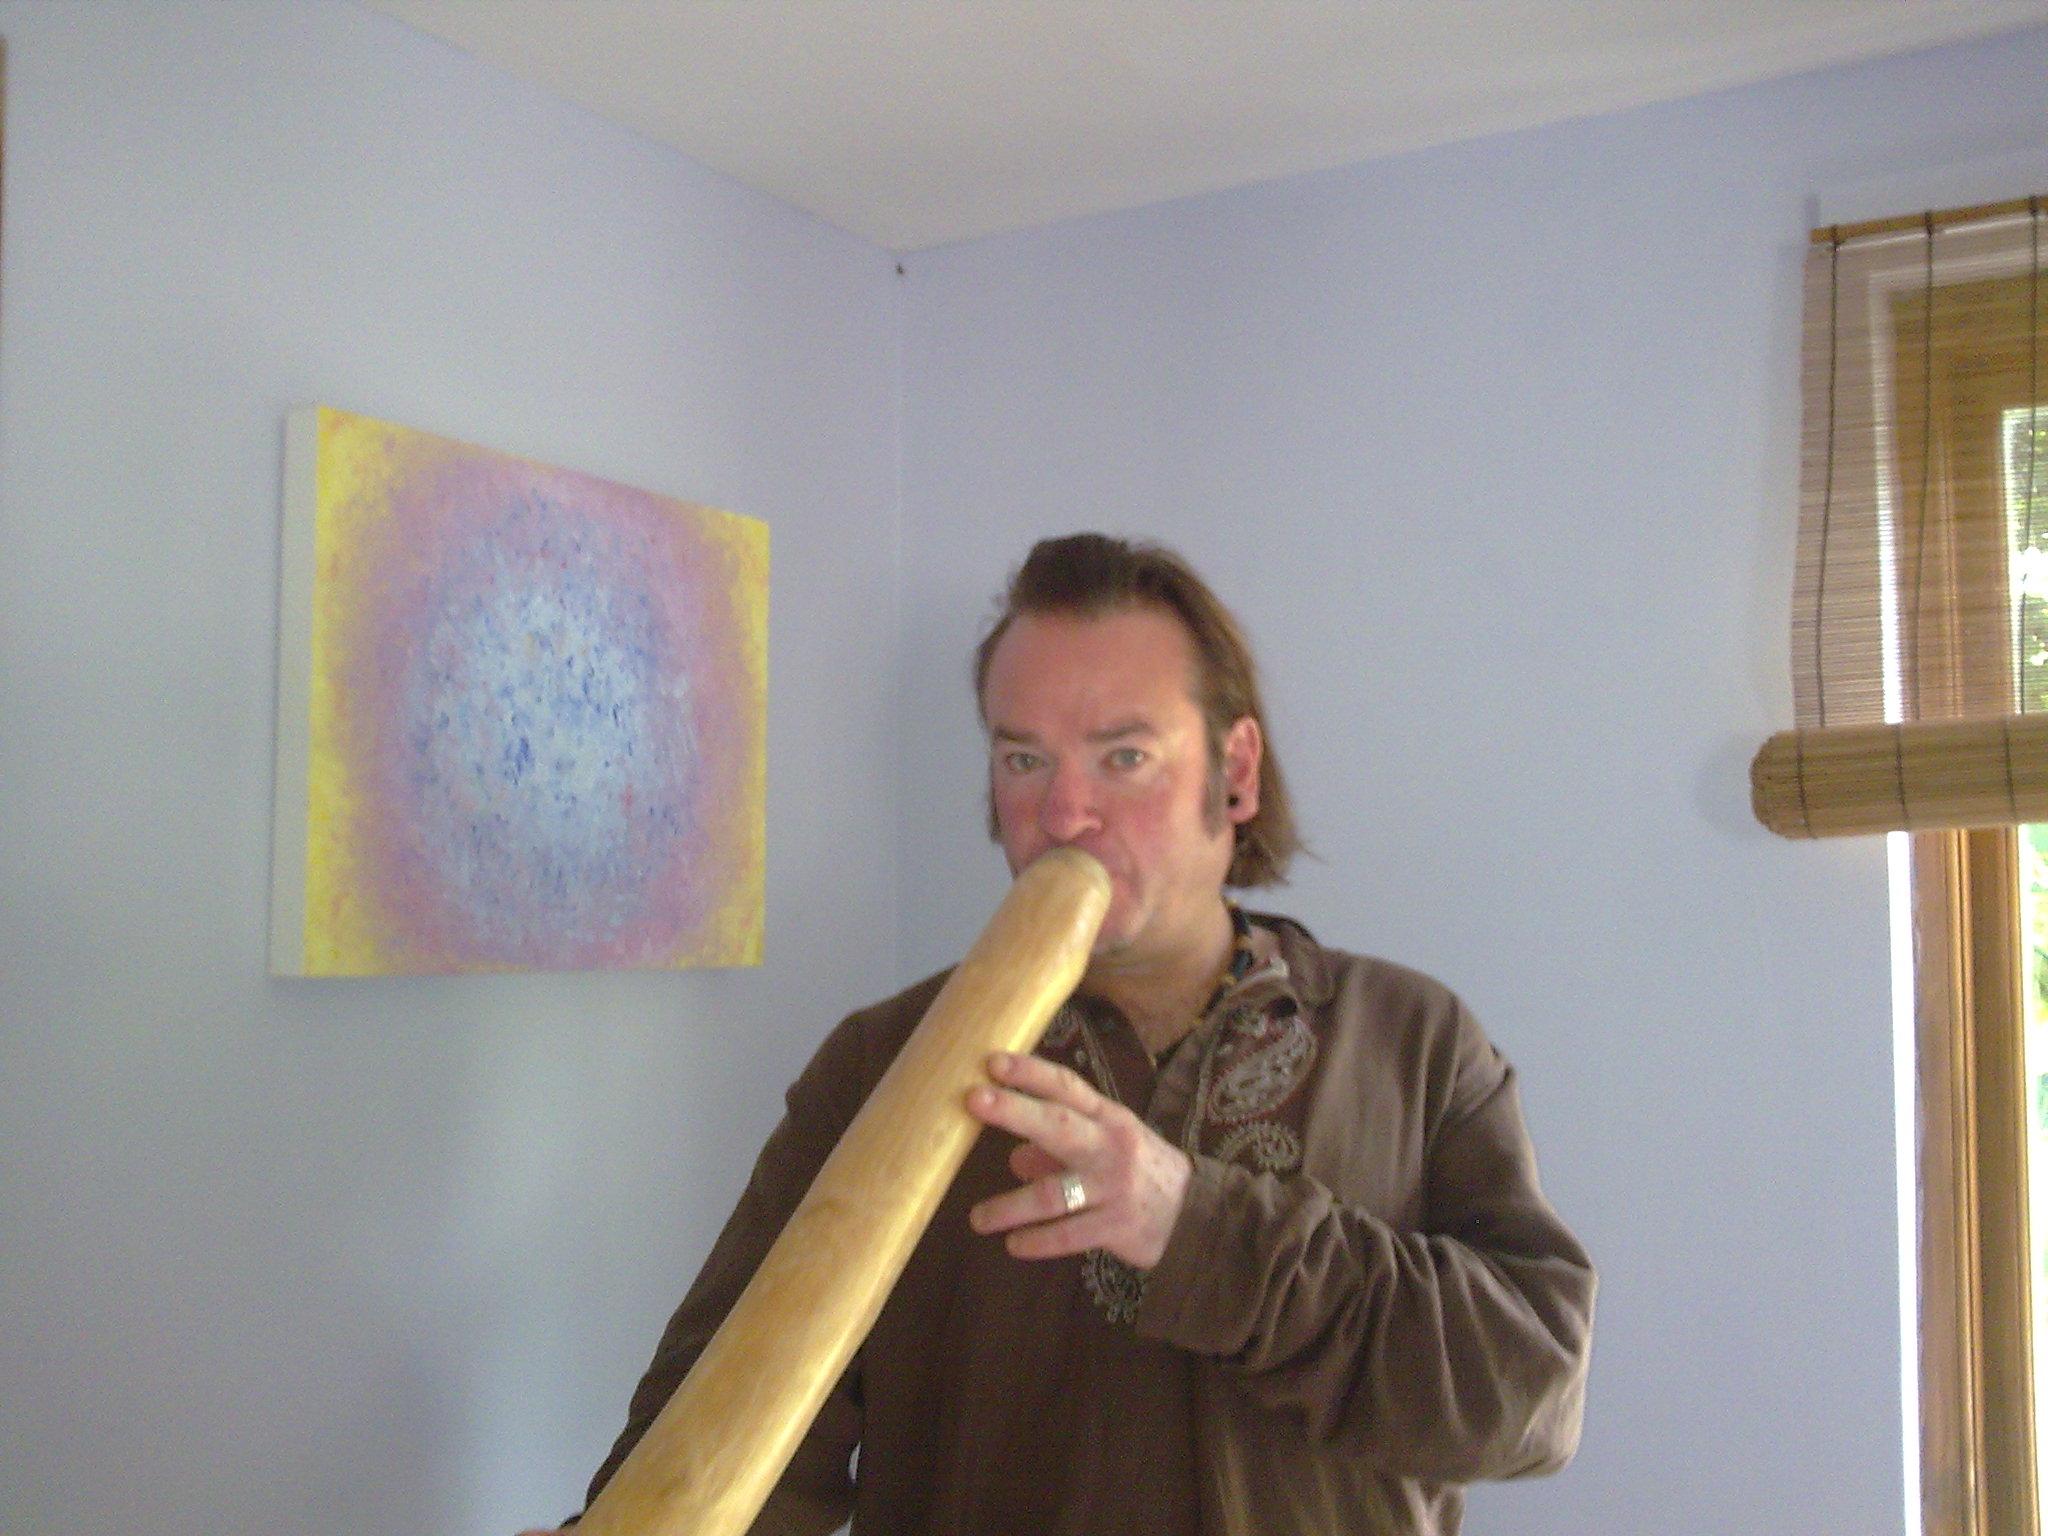 Chris with Didgeridoo